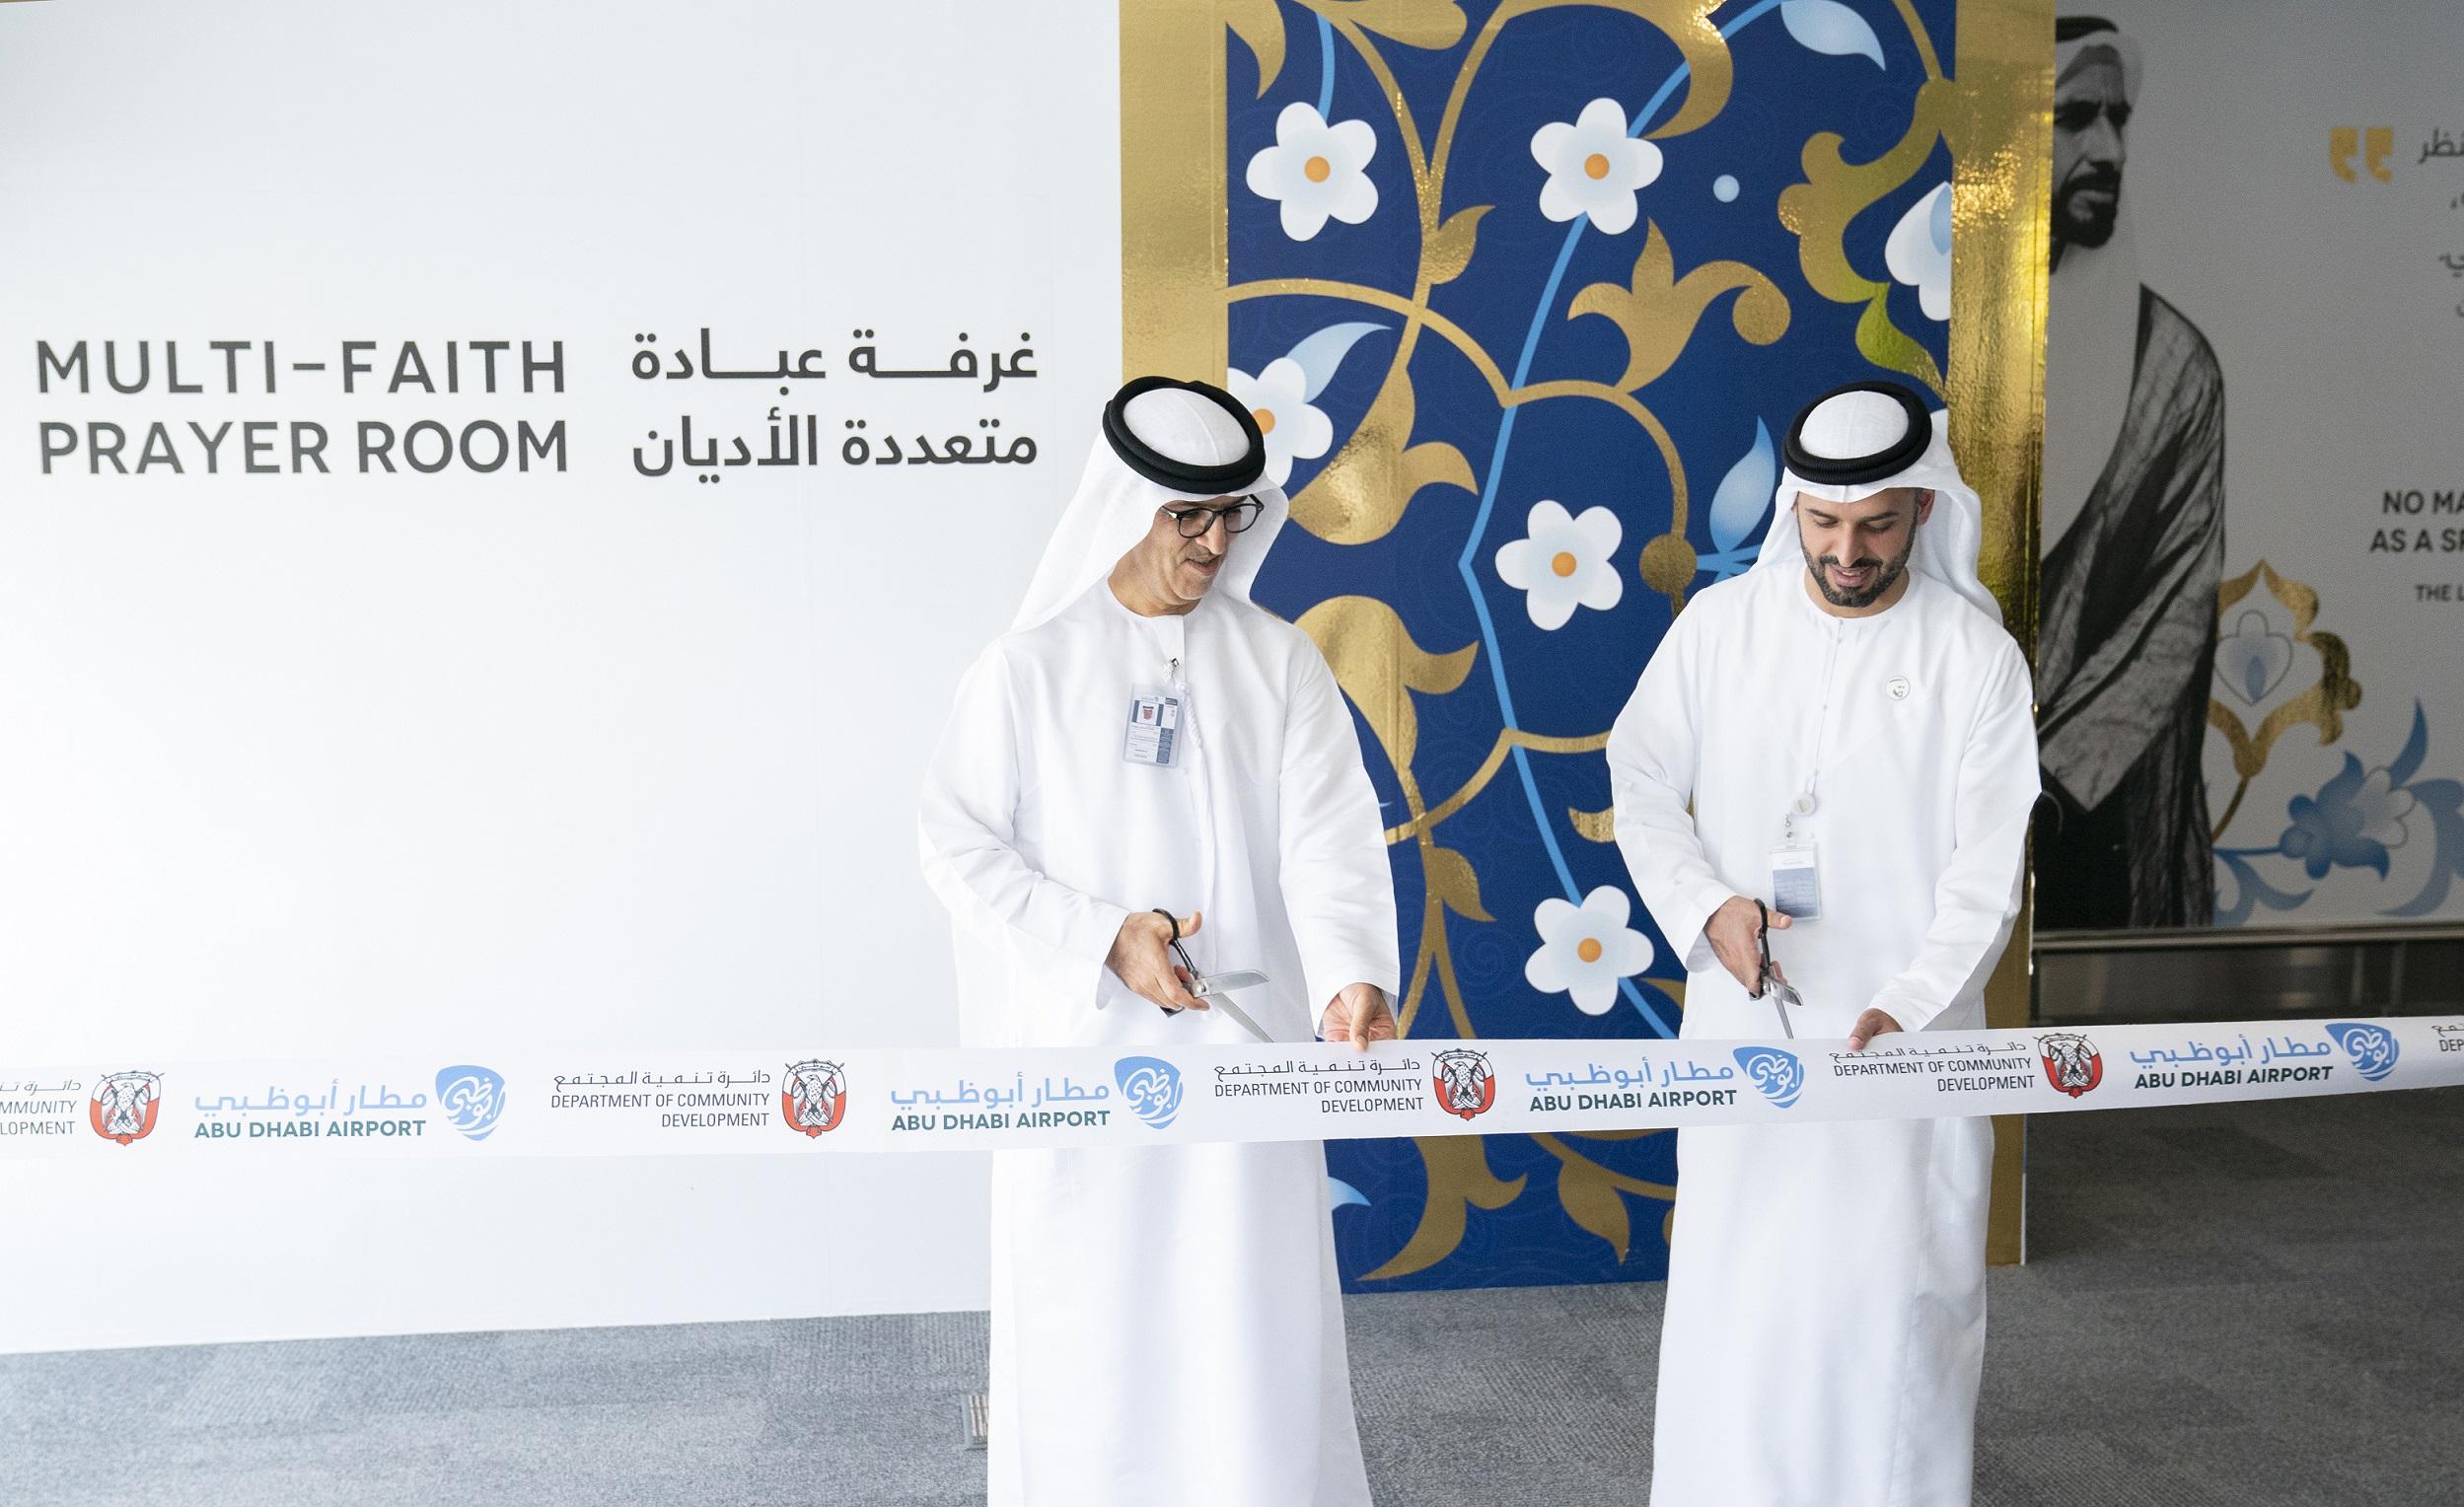 abu dhabi international airport officially opens multi-faith prayer room 2